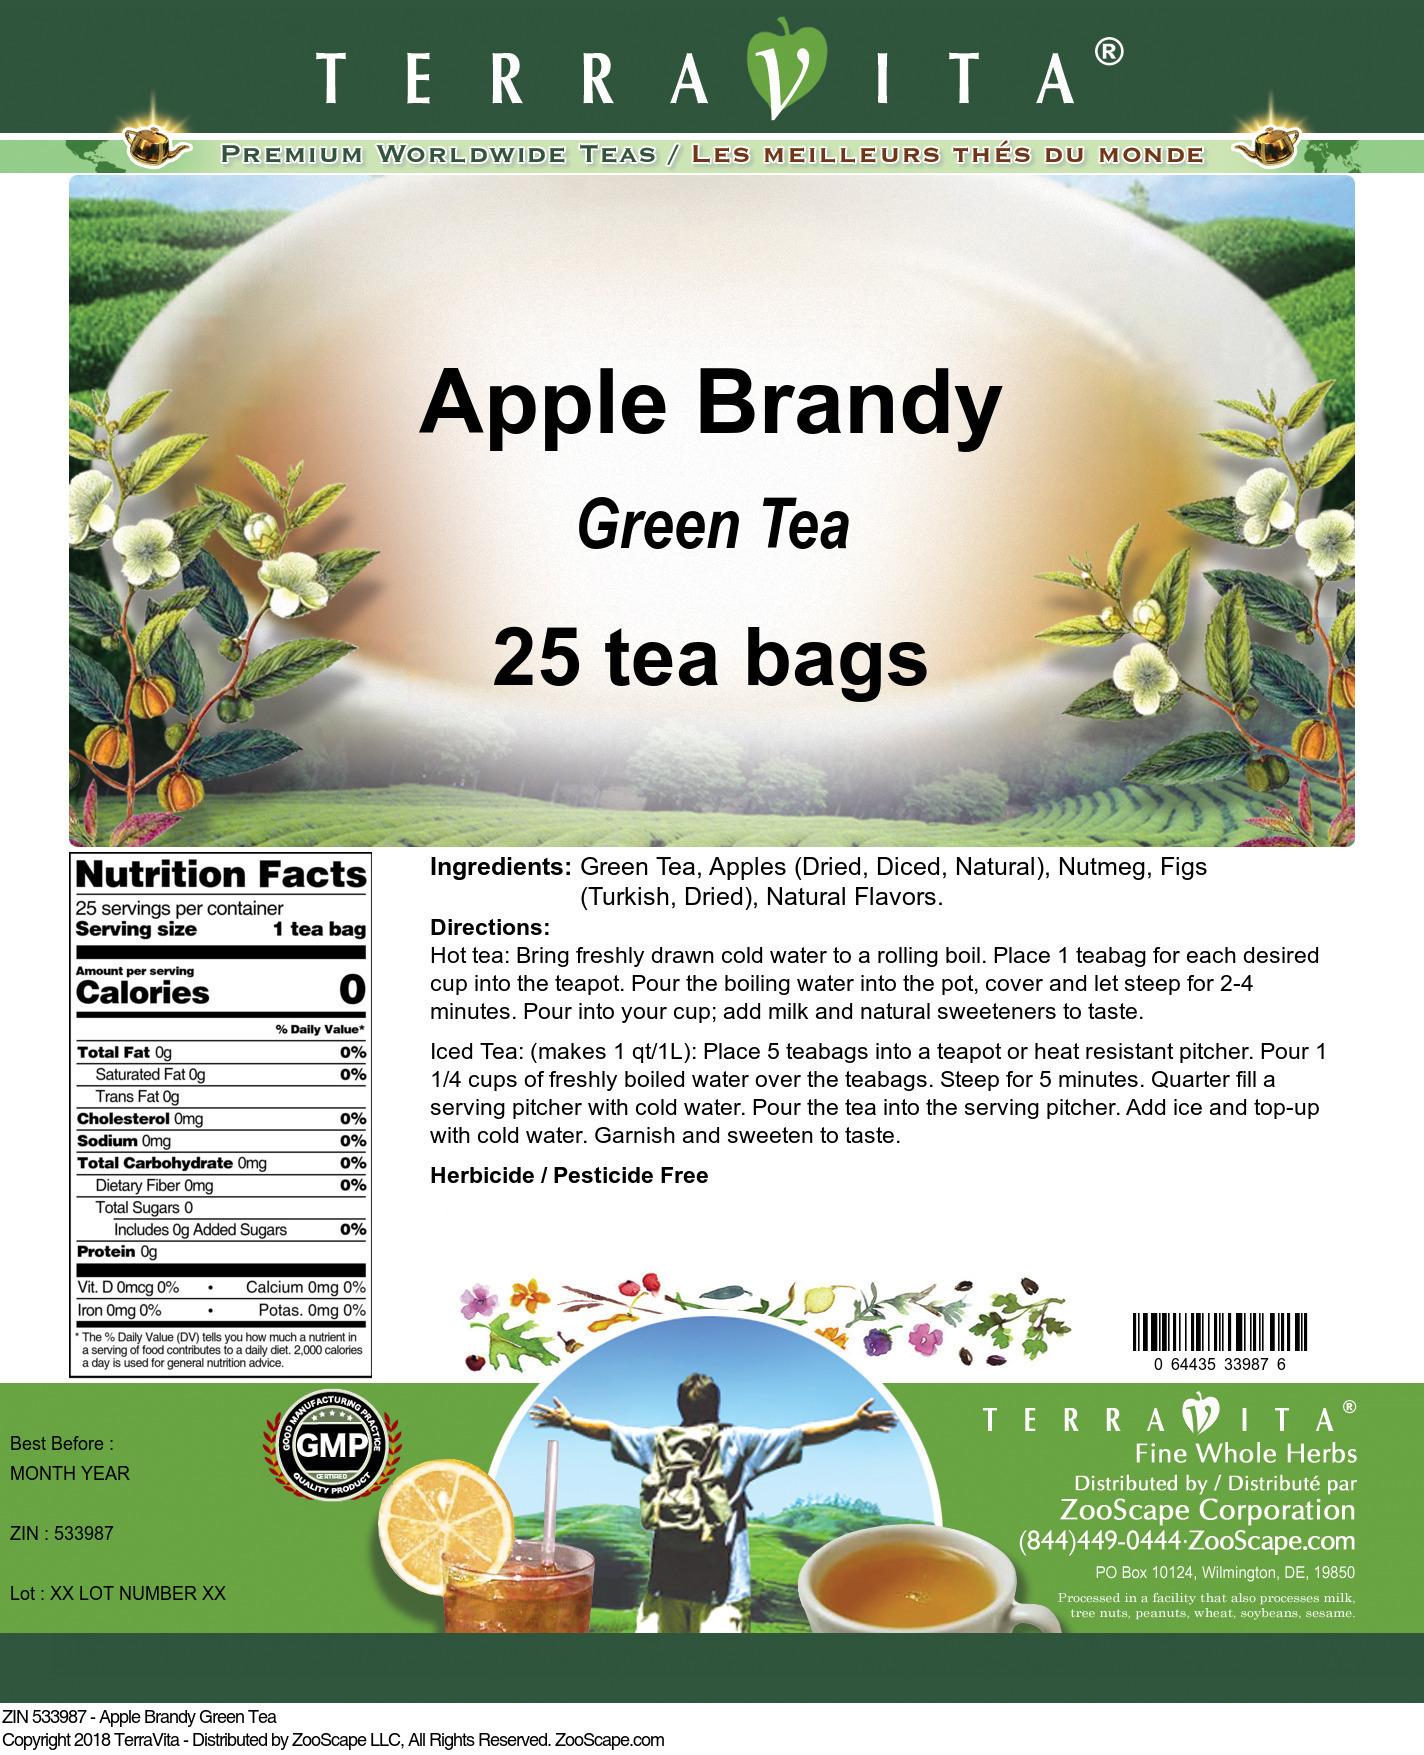 Apple Brandy Green Tea